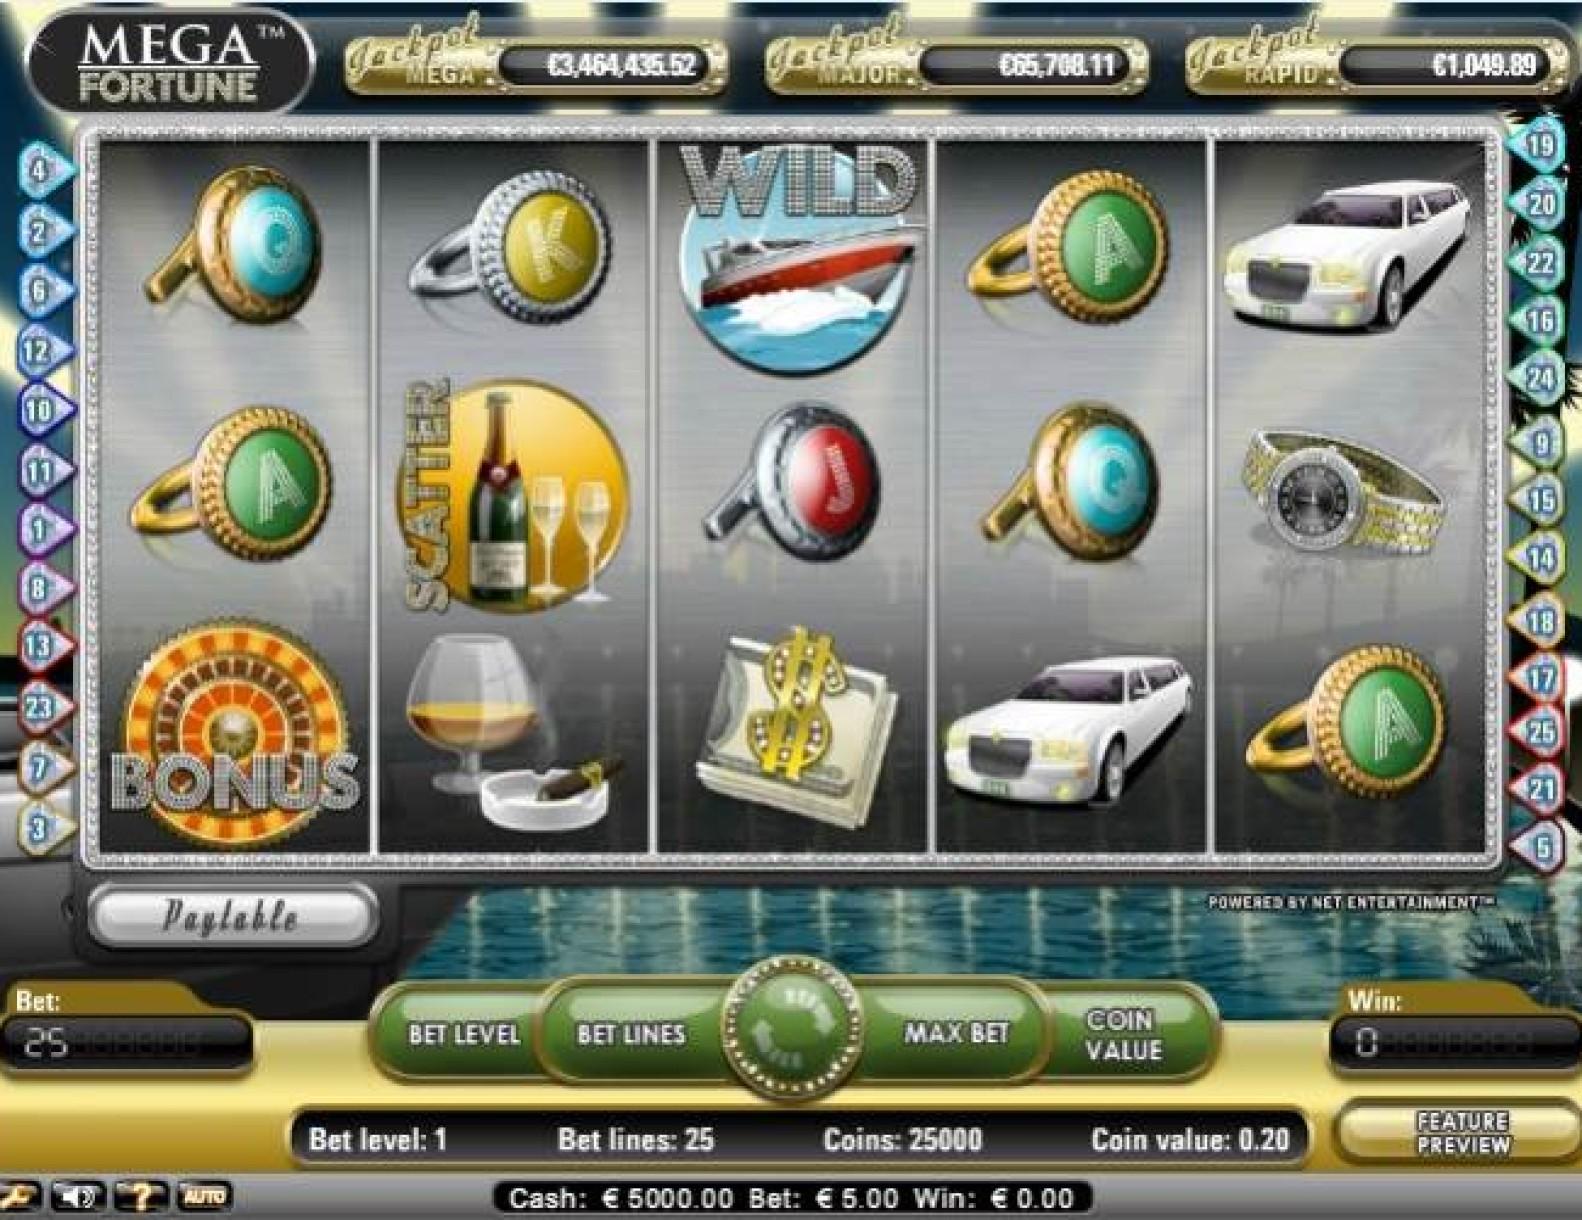 Mega Jackpot Mobile Slot Review – Life Changing Machine ladbrokes free spins netent games slots netent casino